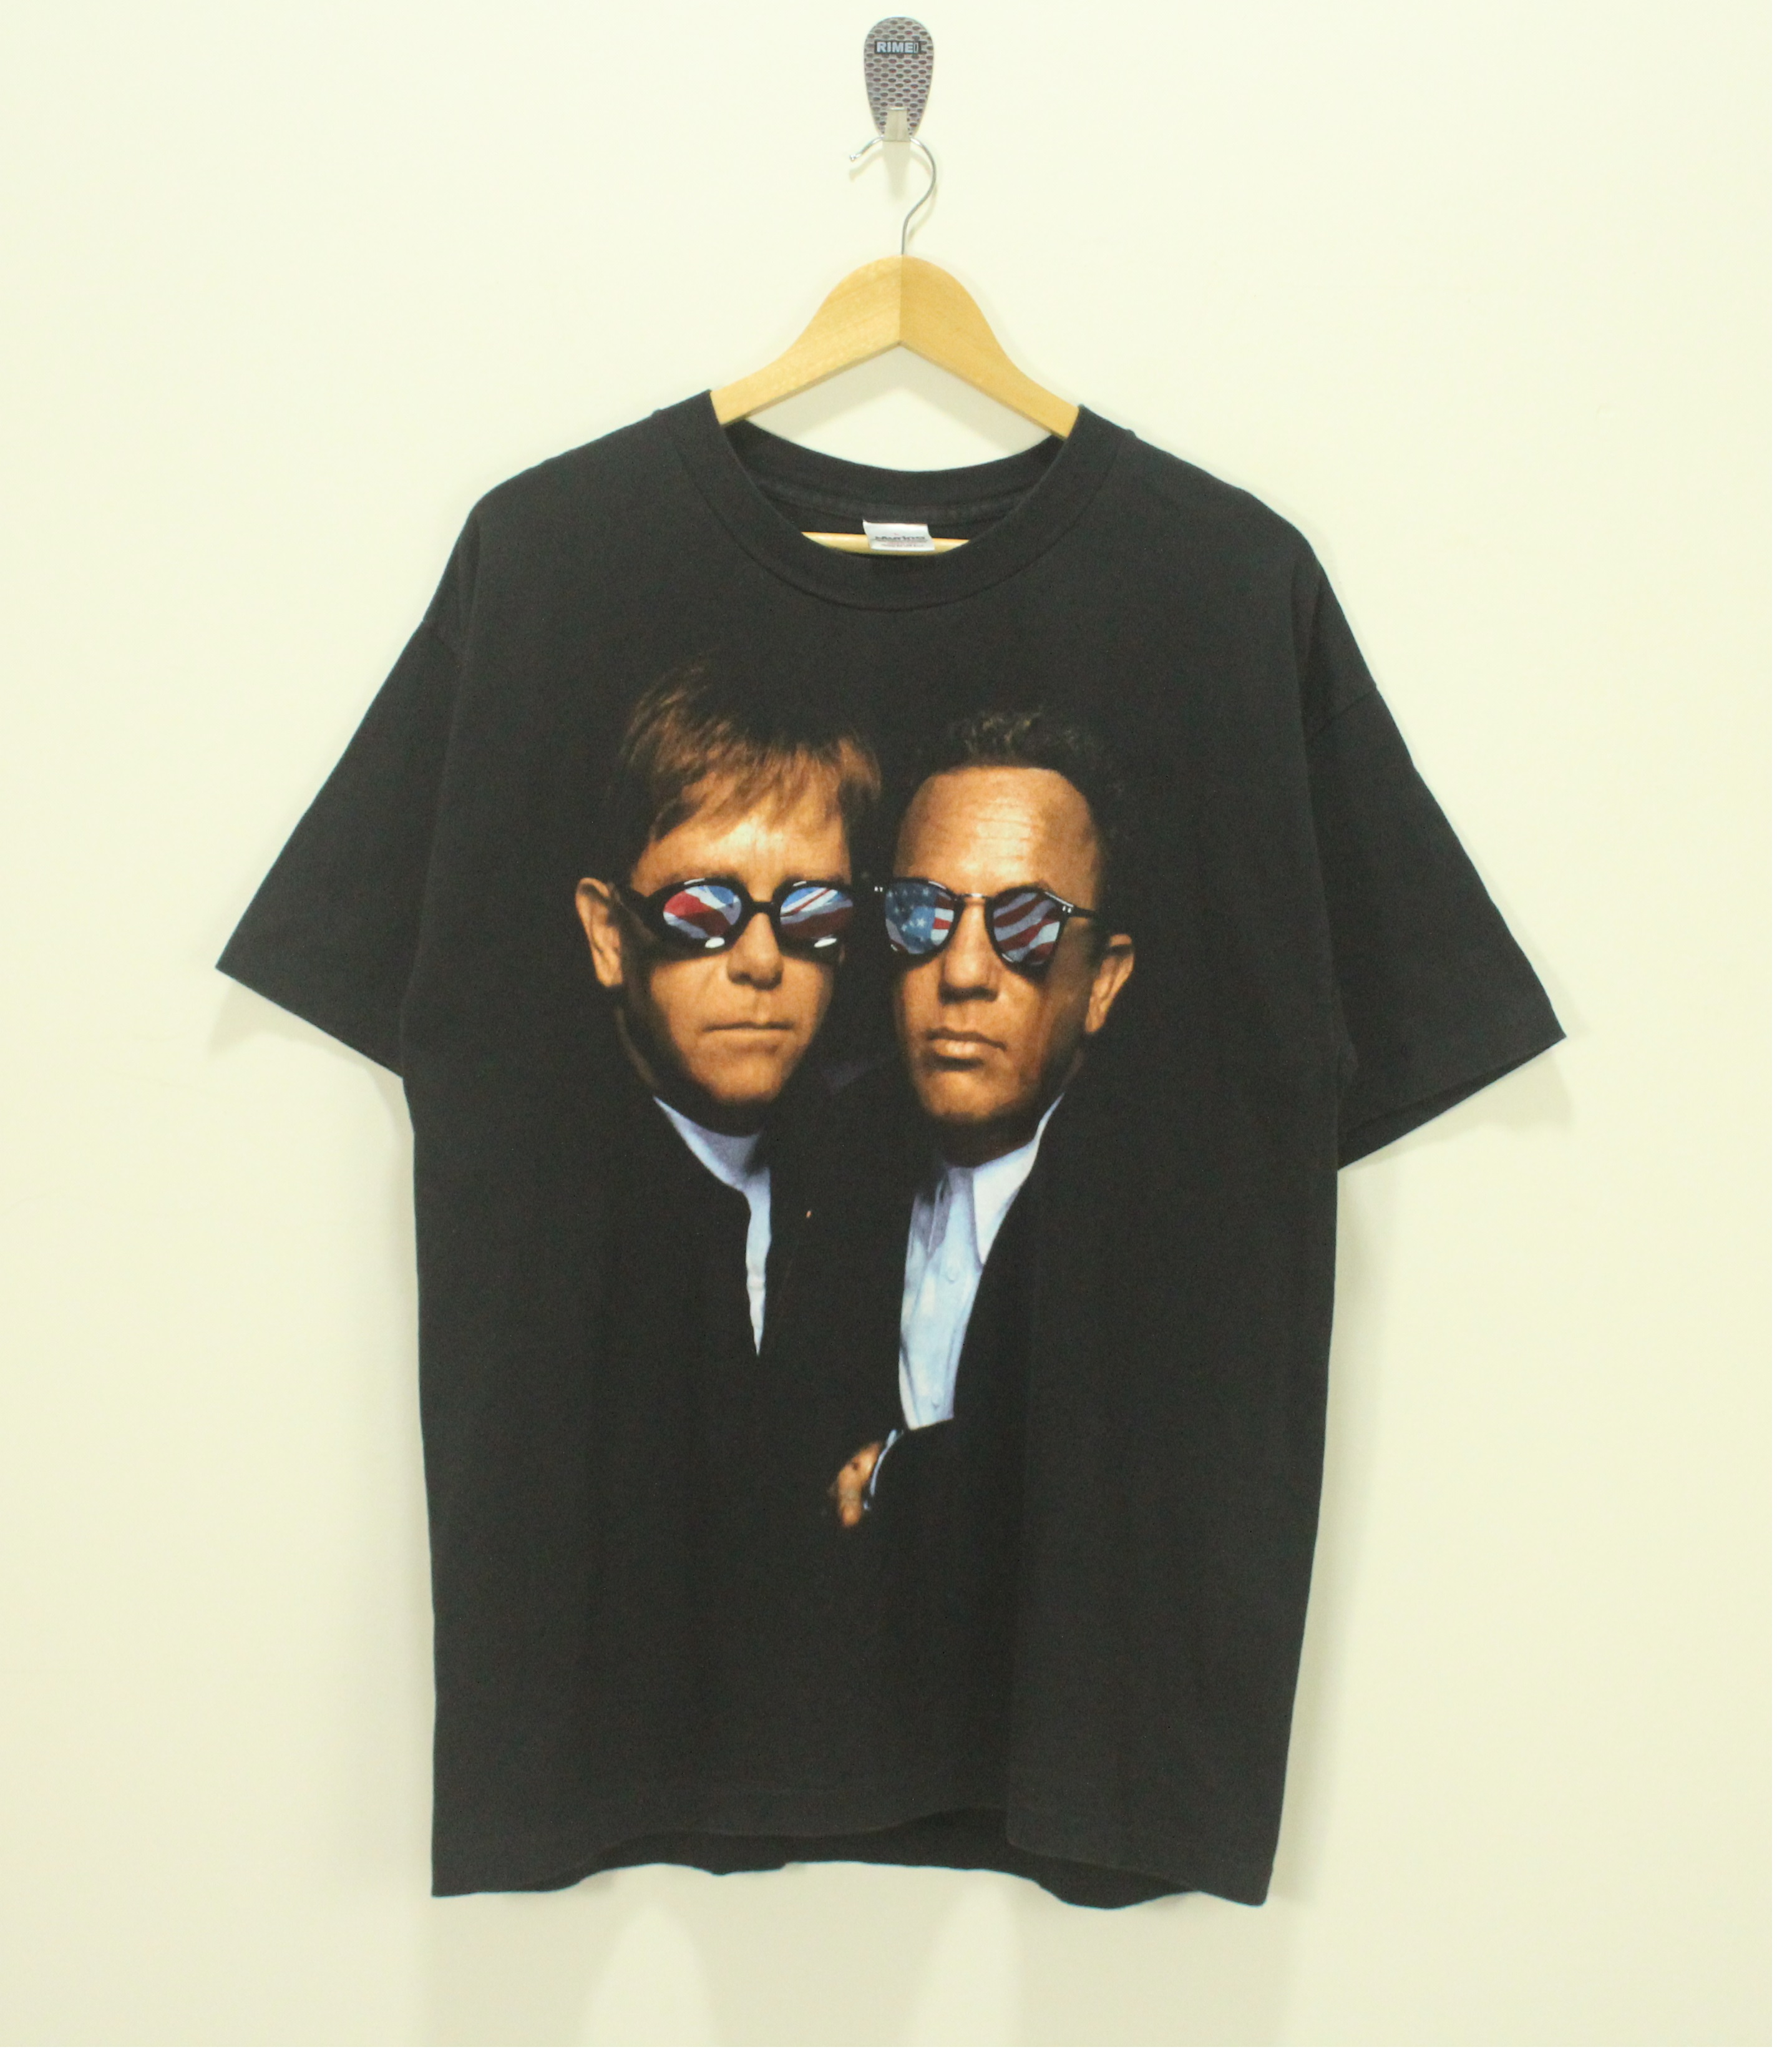 Vintage 1997 Elton John Shirt VTG 90s Single Stitch Music Tshirt Pop Culture Band Tee Size Large Unisex Adult